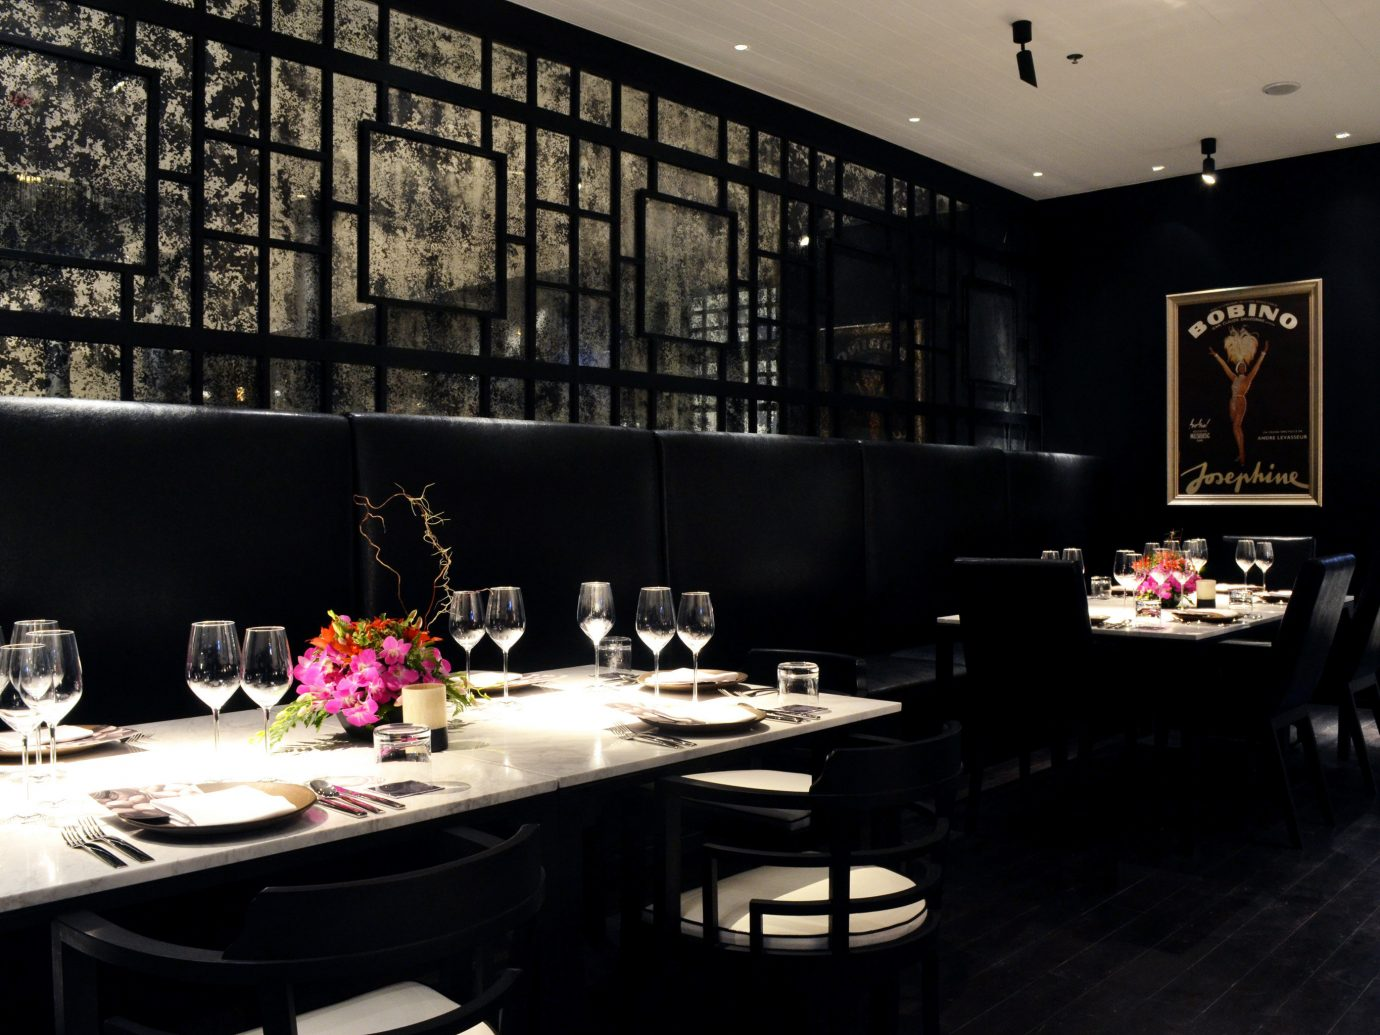 Bar City Dining Drink Eat Hotels Luxury Romance indoor table room restaurant meal interior design dining room lighting Design area furniture